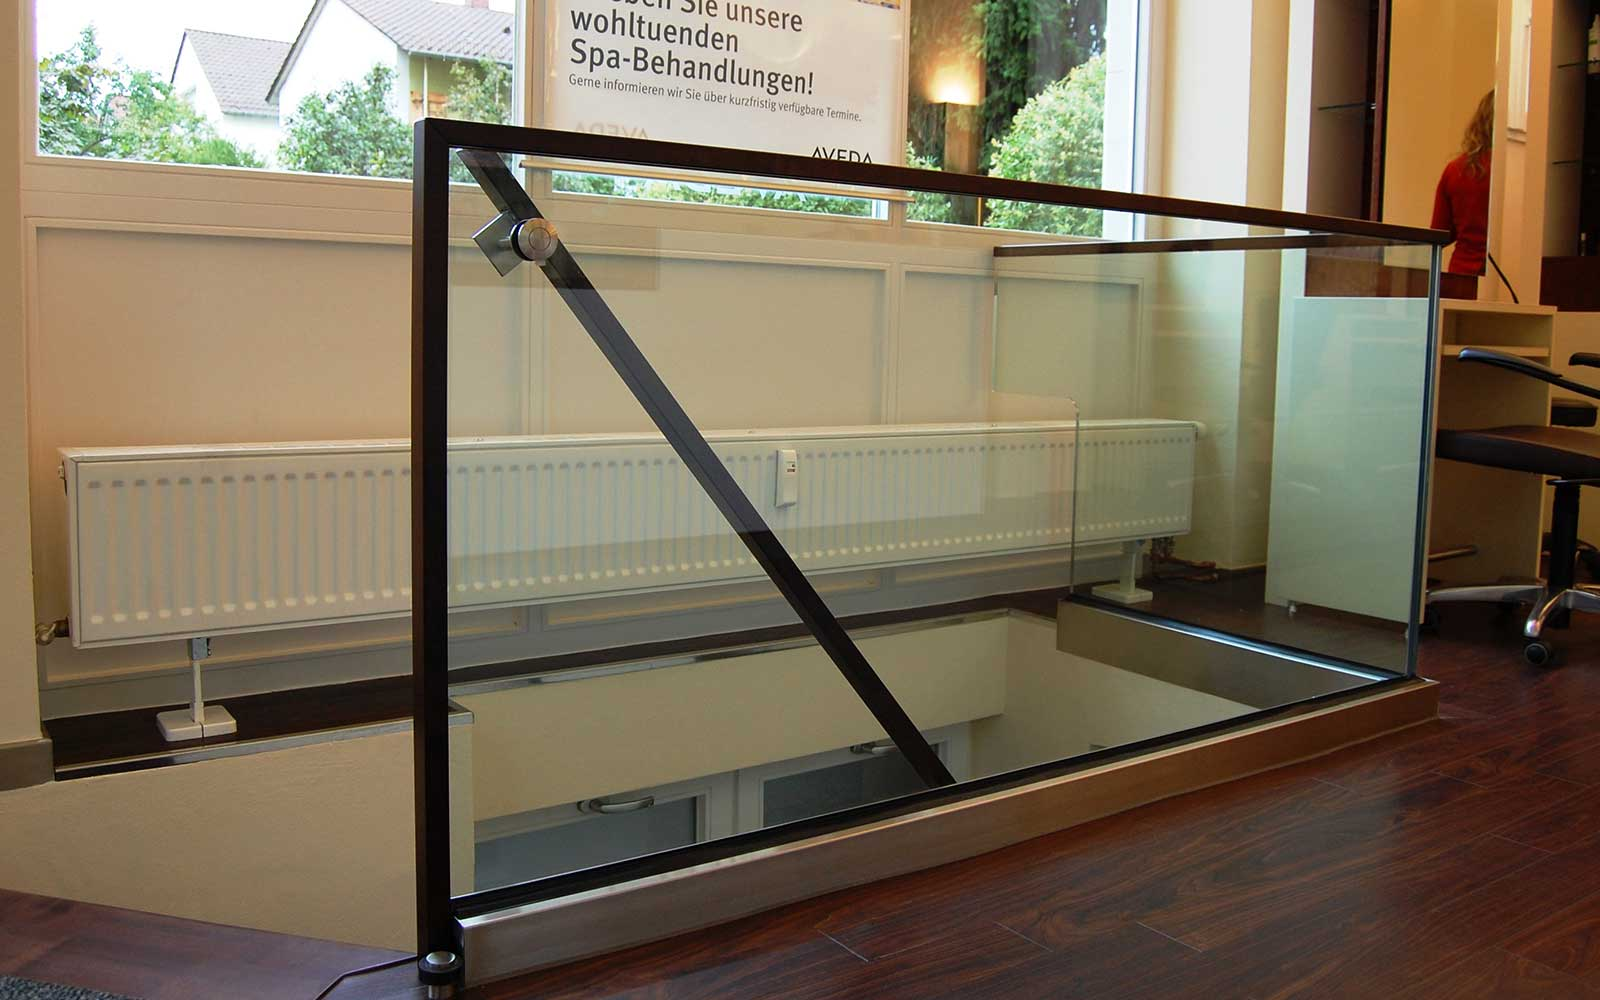 Kosmetiksalon Heidelberg, Kochhan und Weckbach Architekten